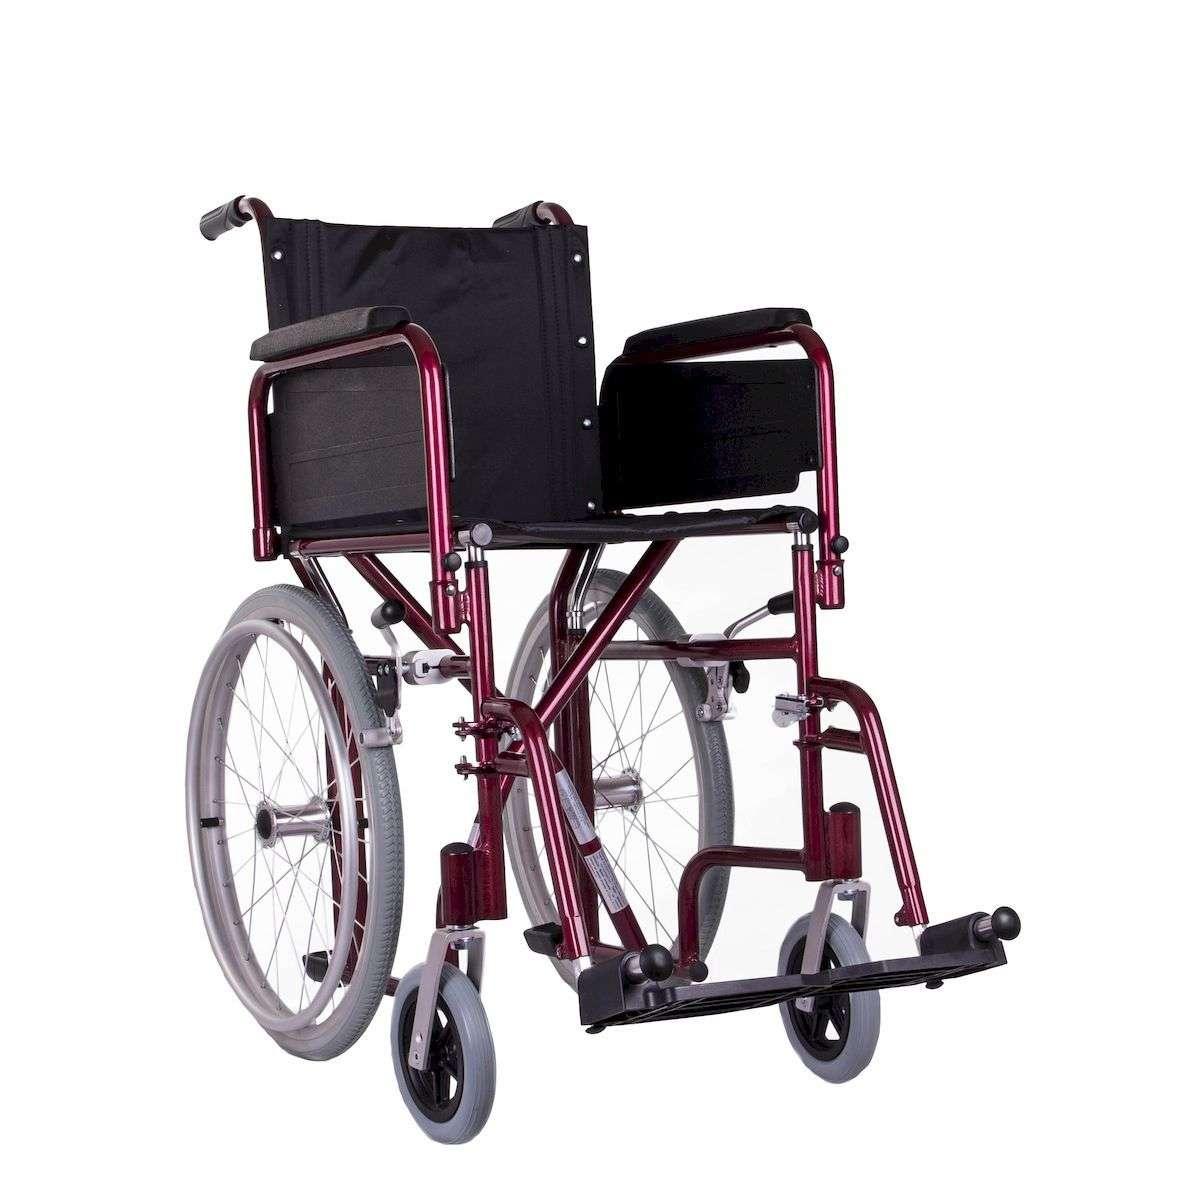 Узкая инвалидная коляска, OSD Slim